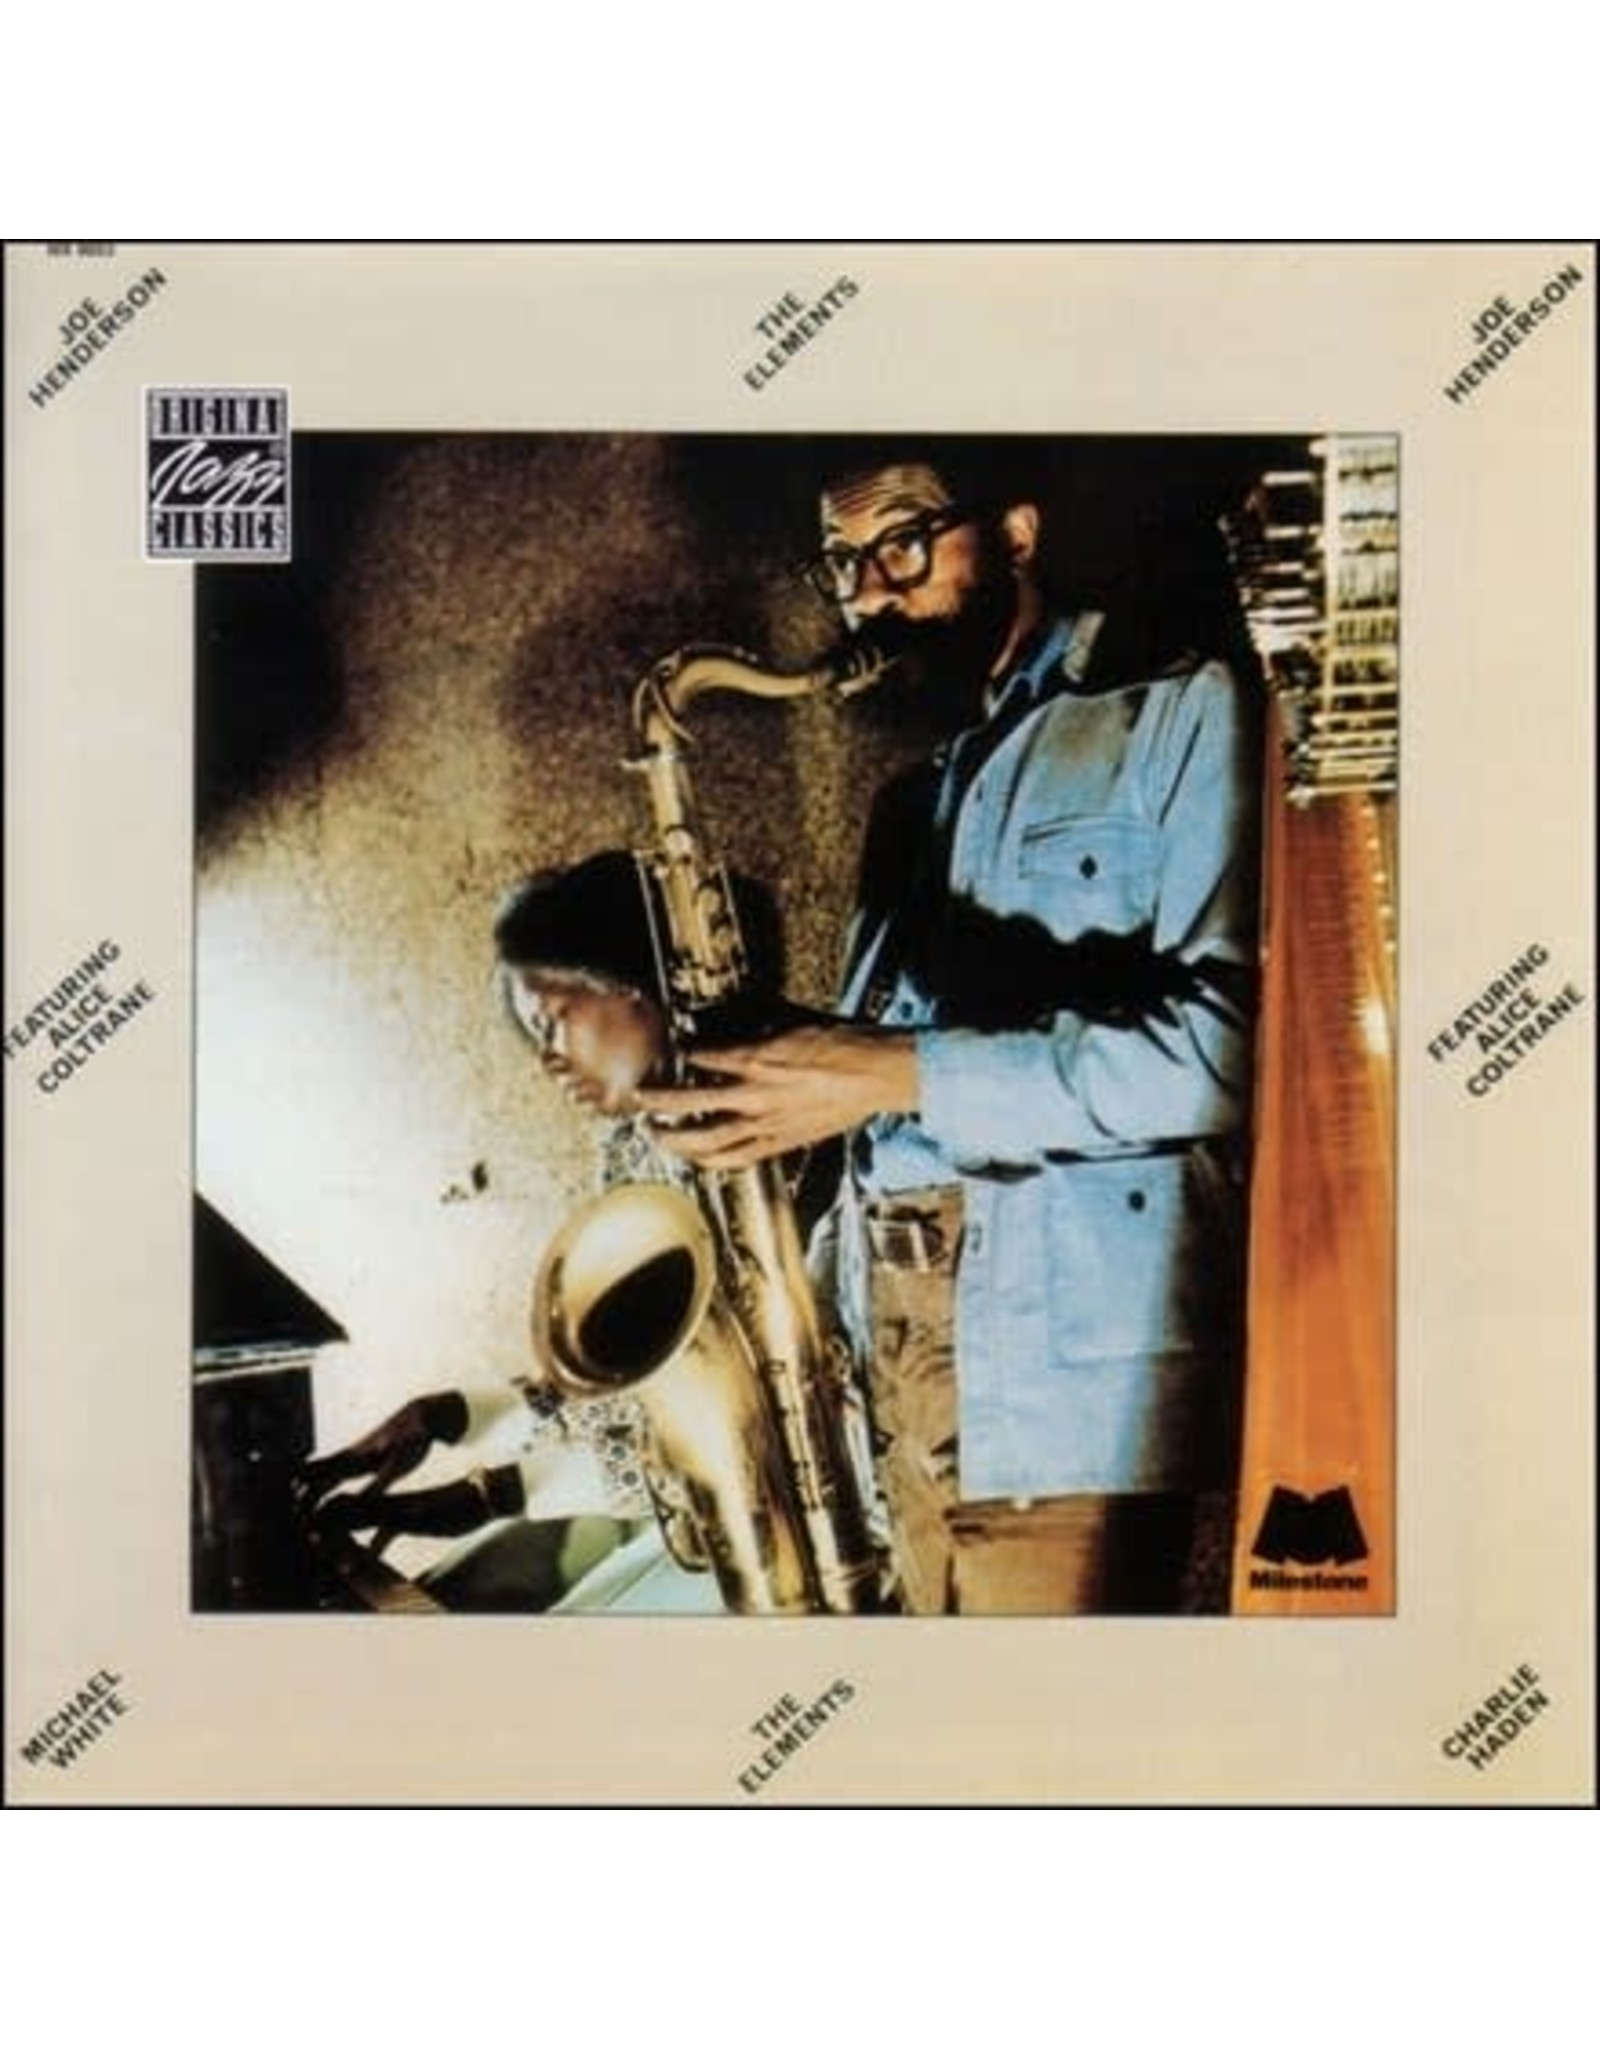 Fantasy Henderson, Joe & Alice Coltrane: Elements LP